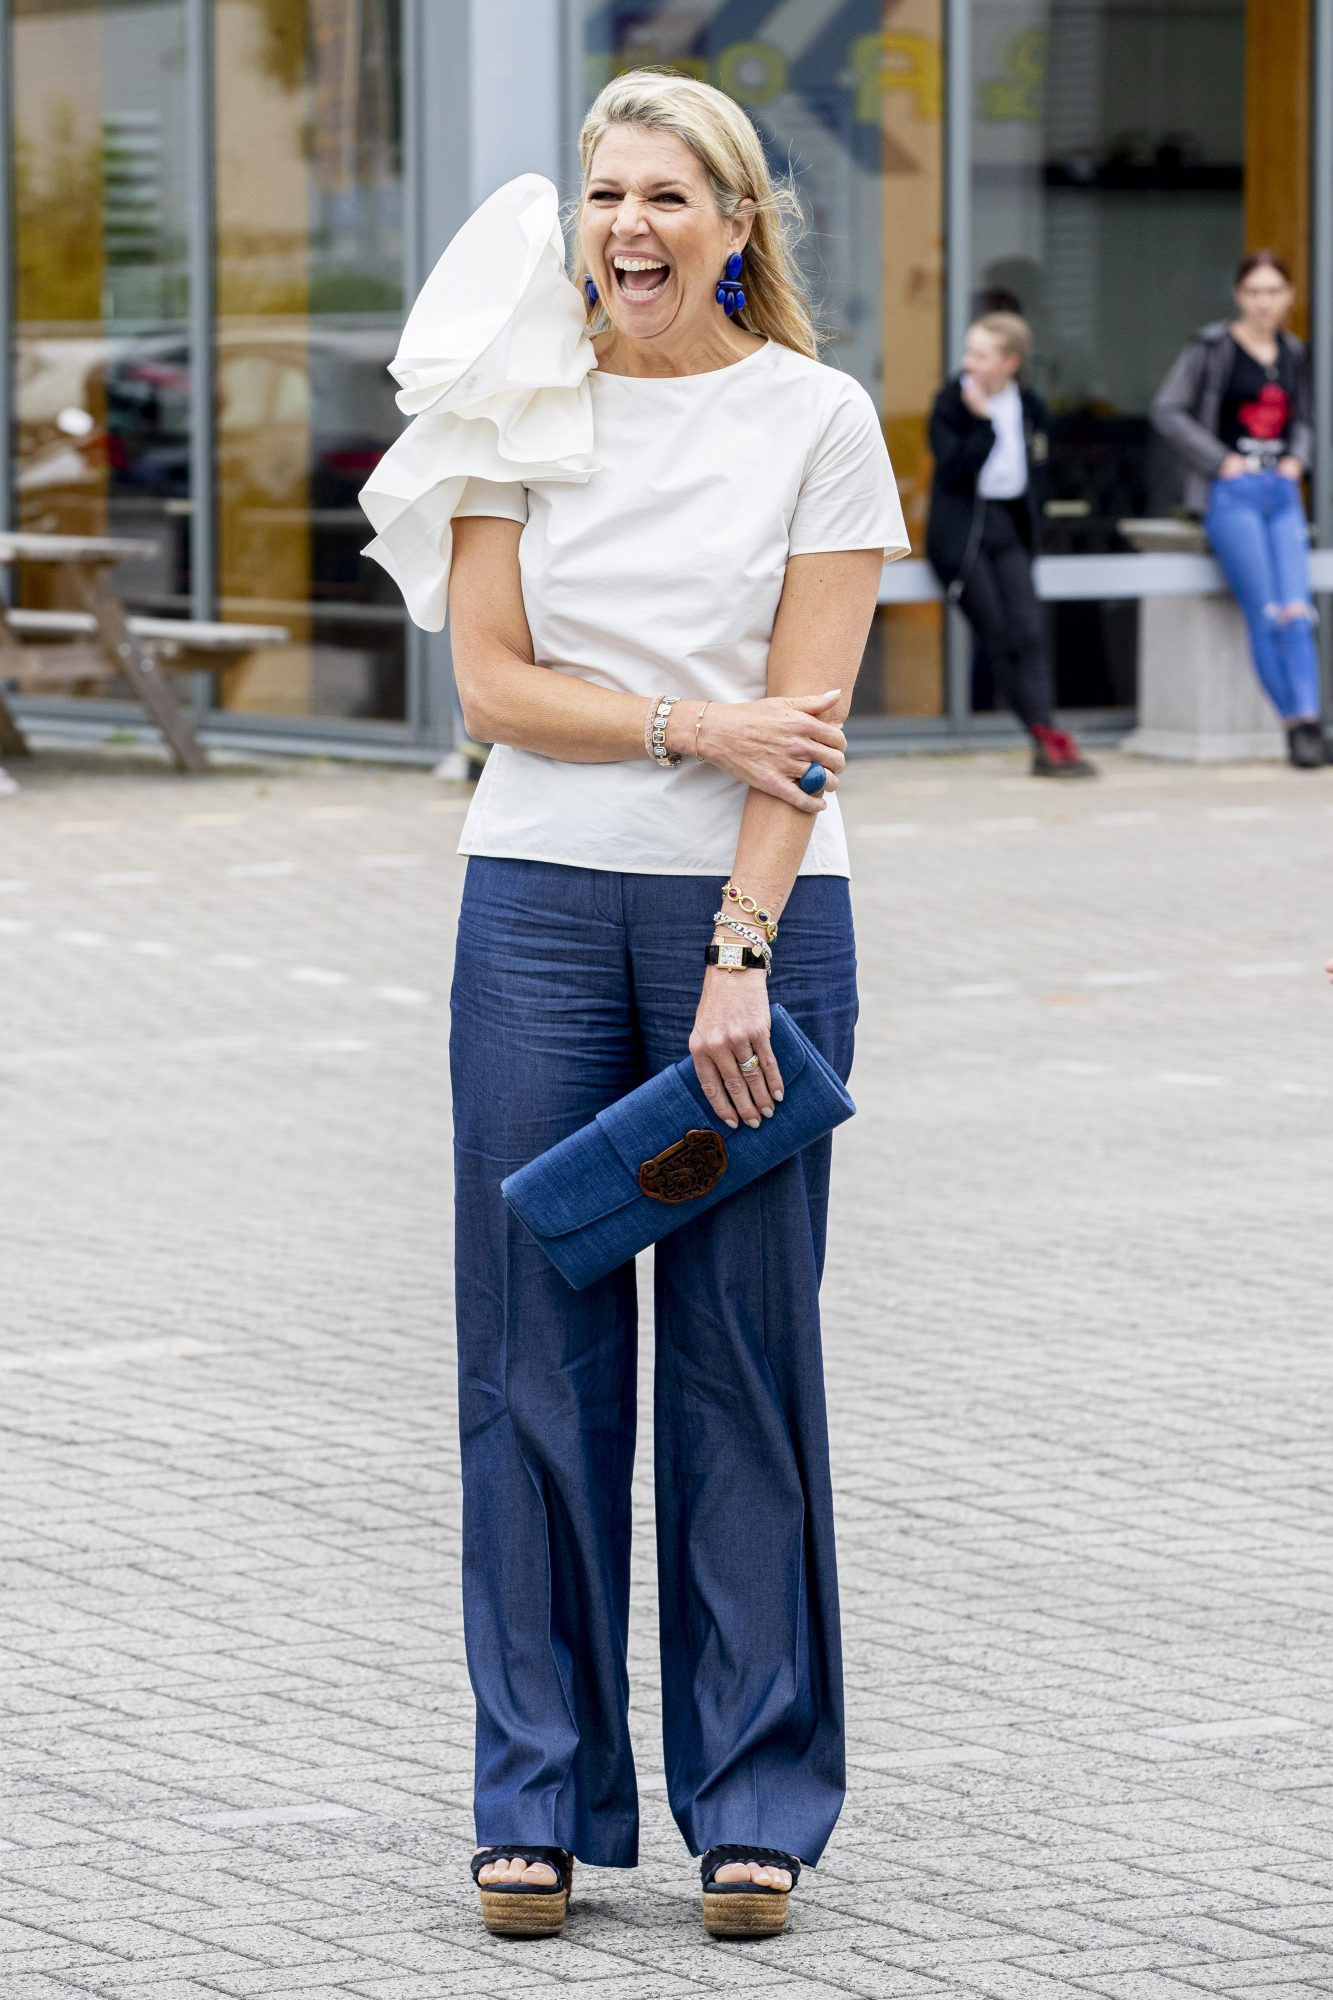 Reina Maxima de Holanda., look del dia, jeans y blusa blanca